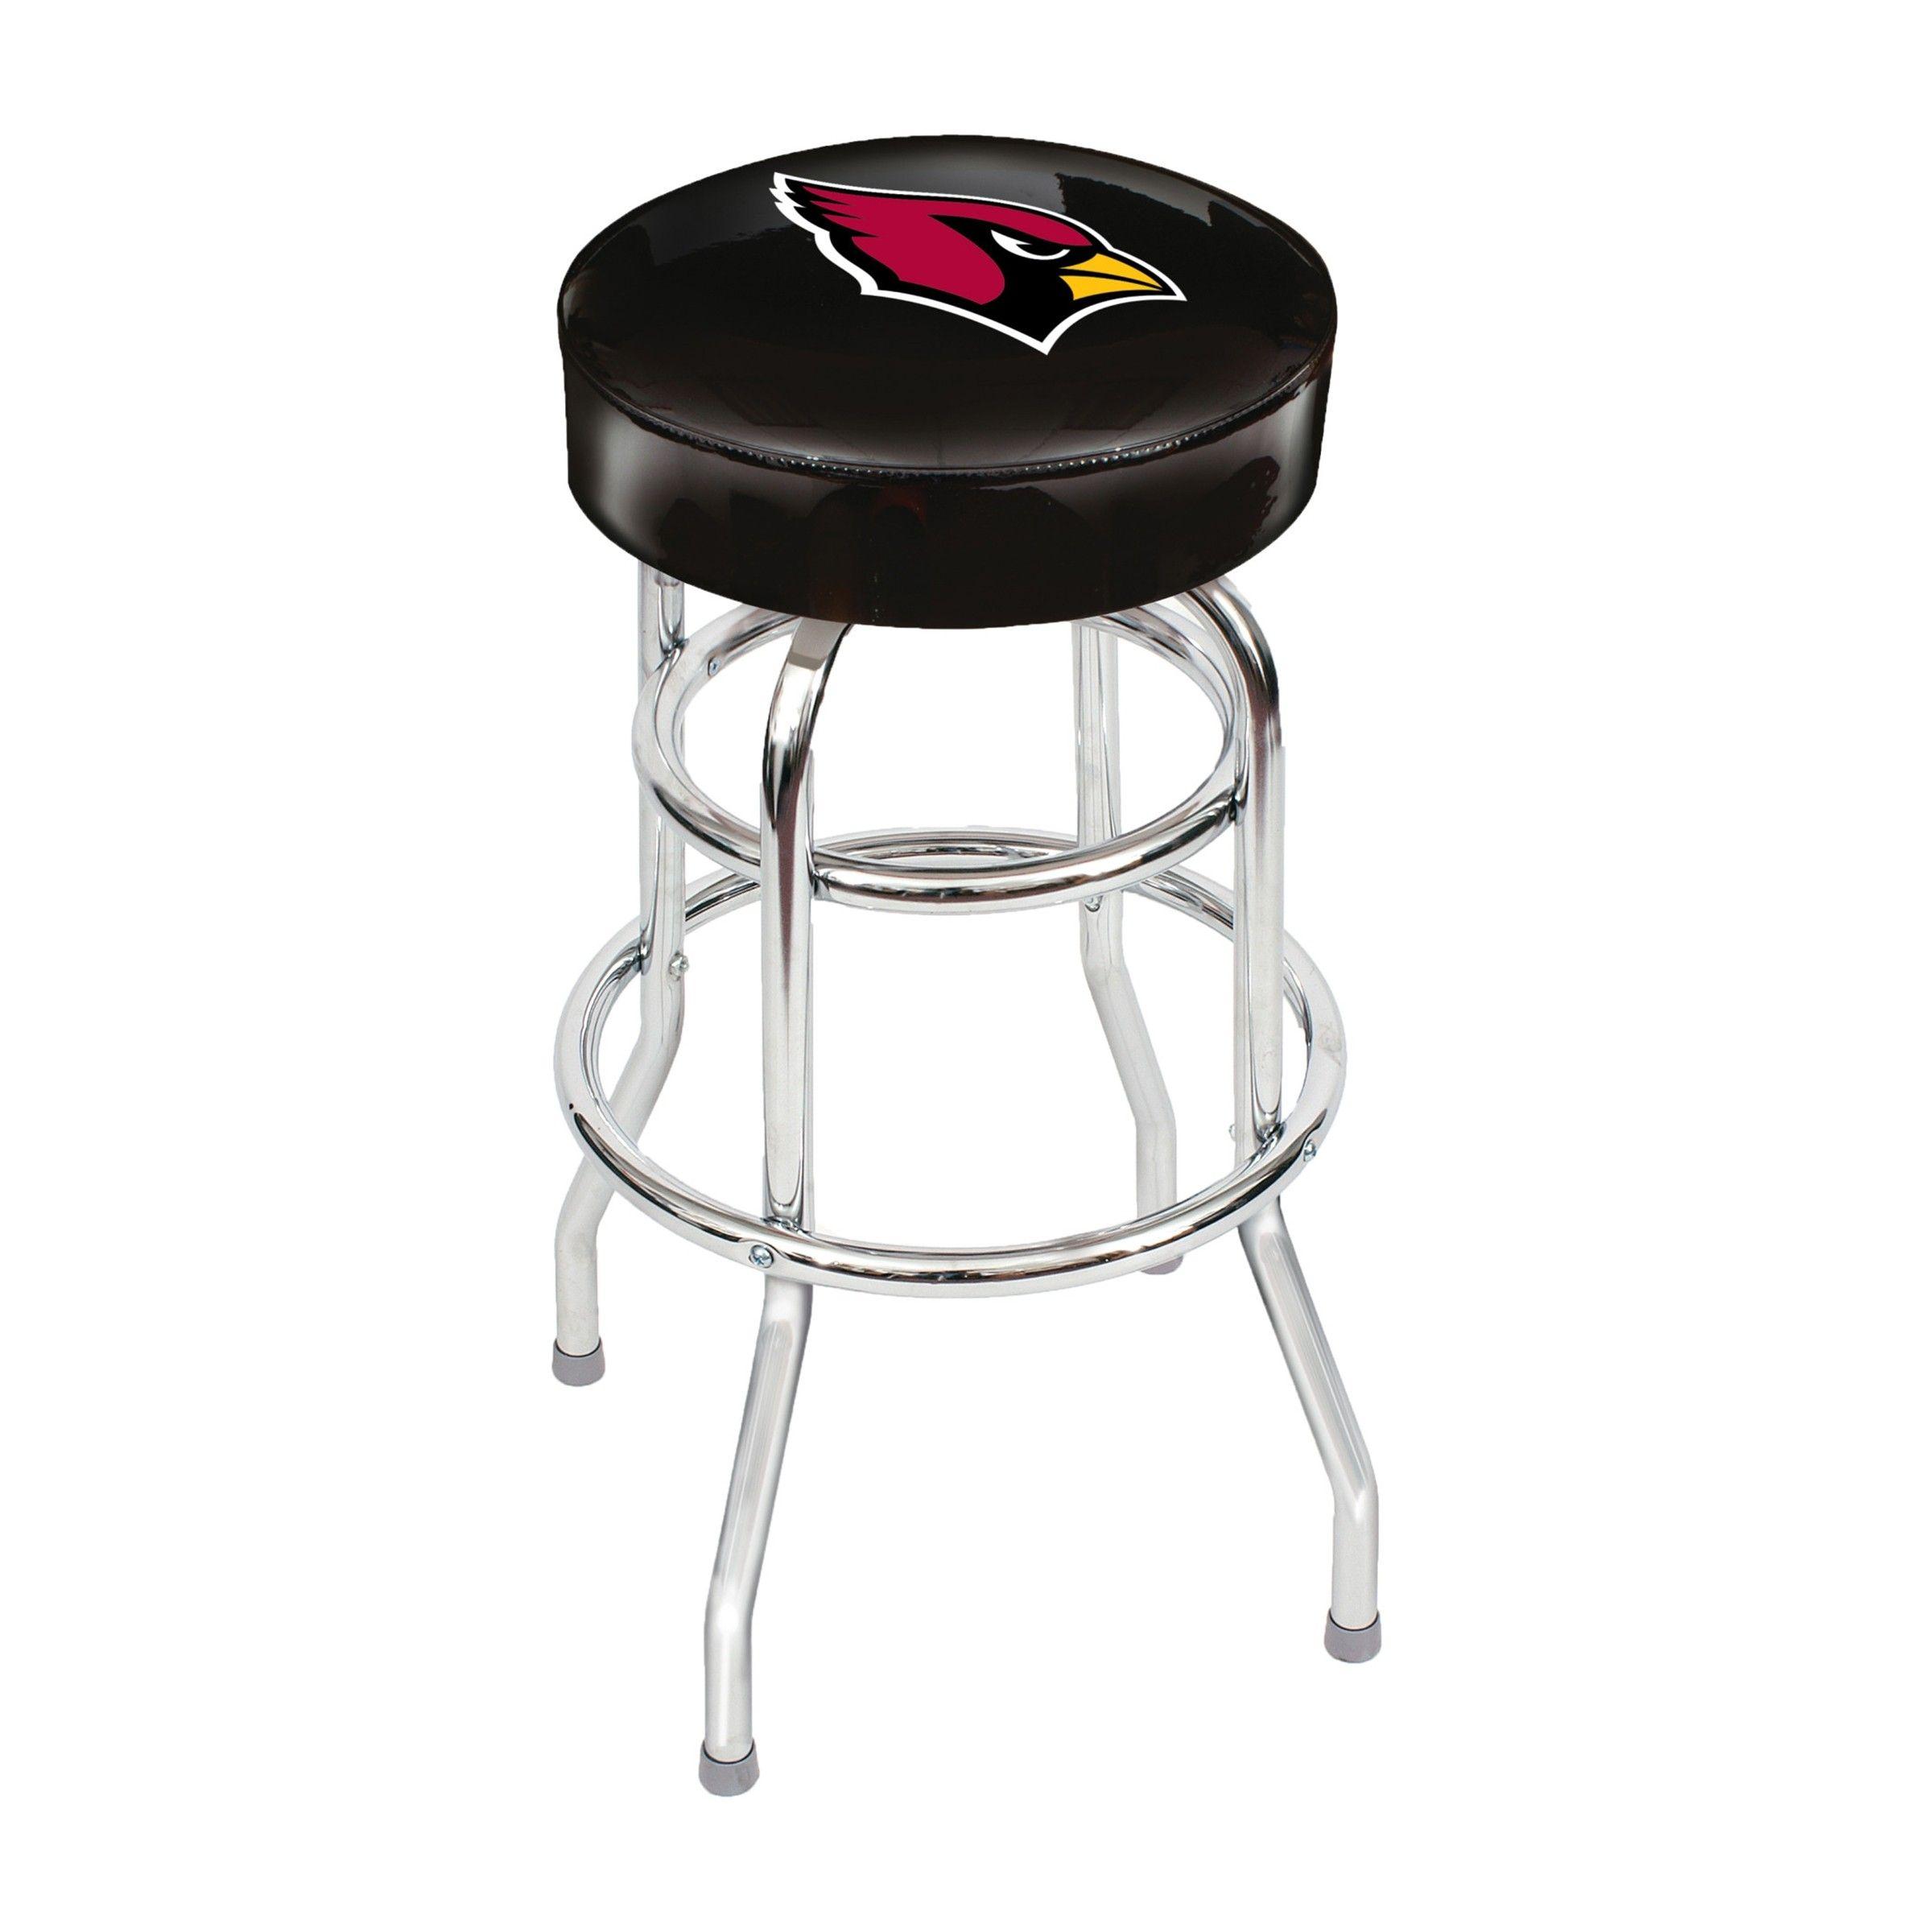 Arizona Cardinals 30 Inch Bar Stool 199.99 Brand